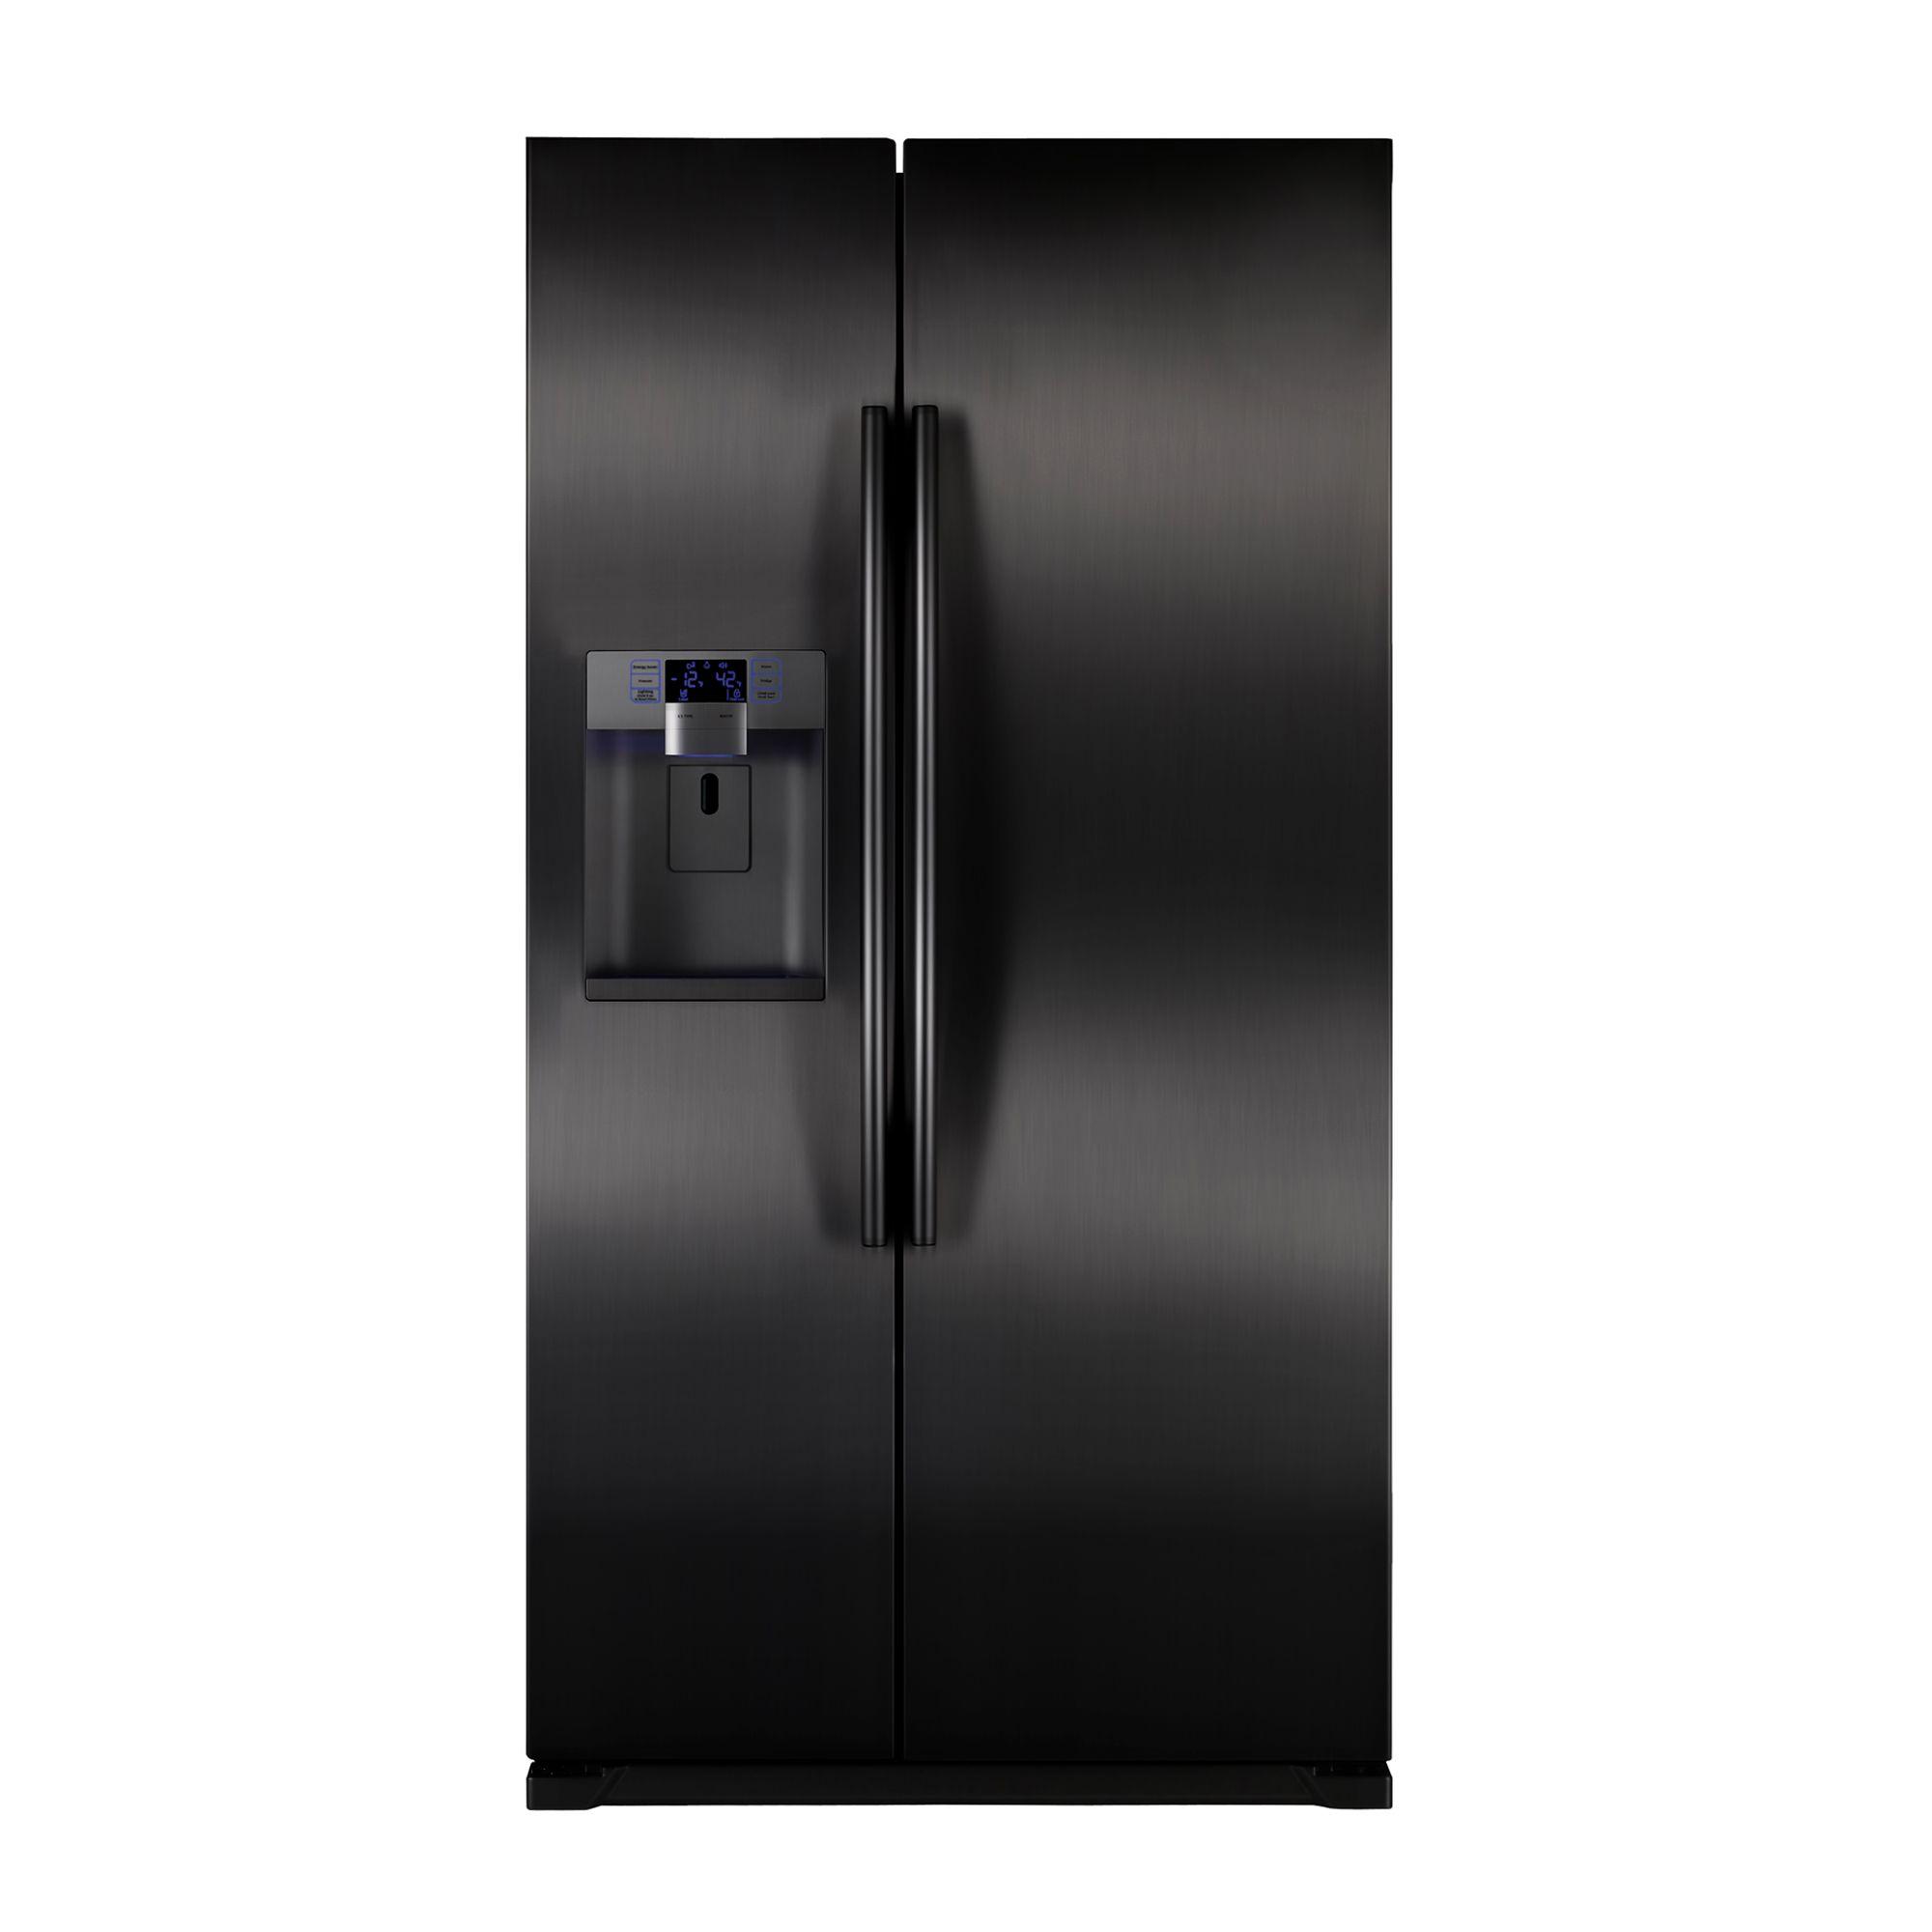 Samsung Rsg257aabp 24 1 Cu Ft Side By Side Refrigerator